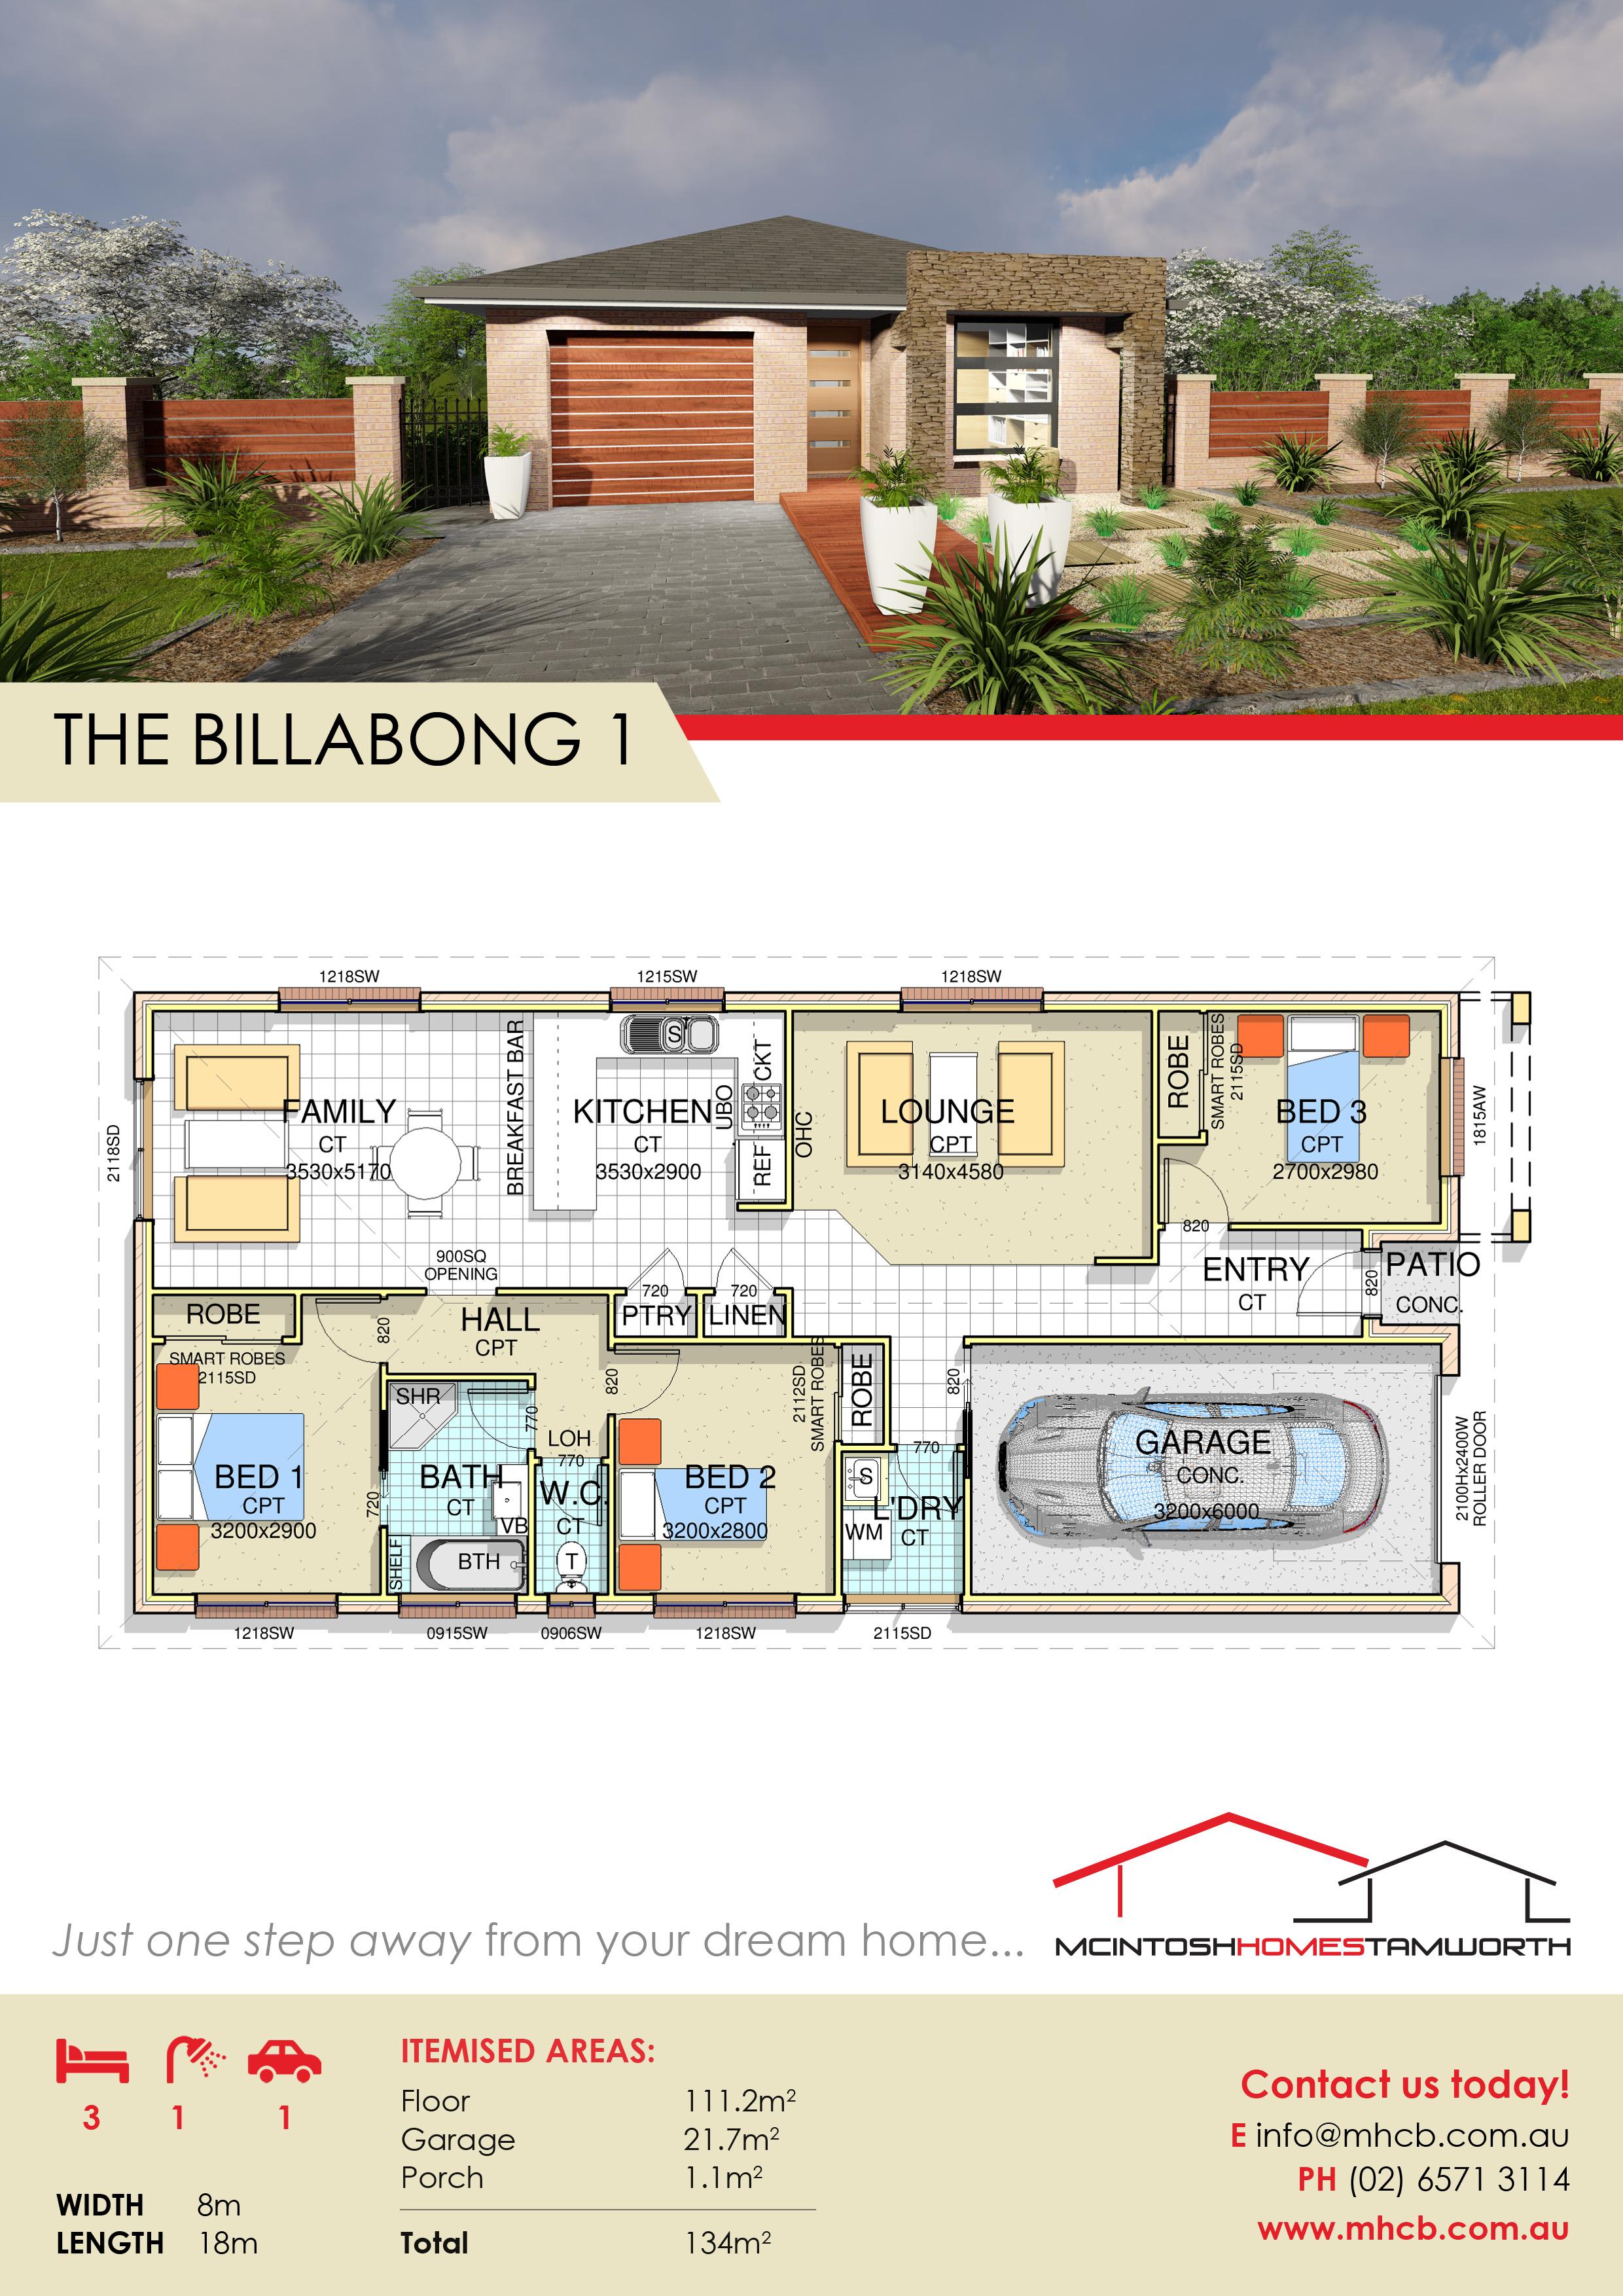 Billabong1_Brochure